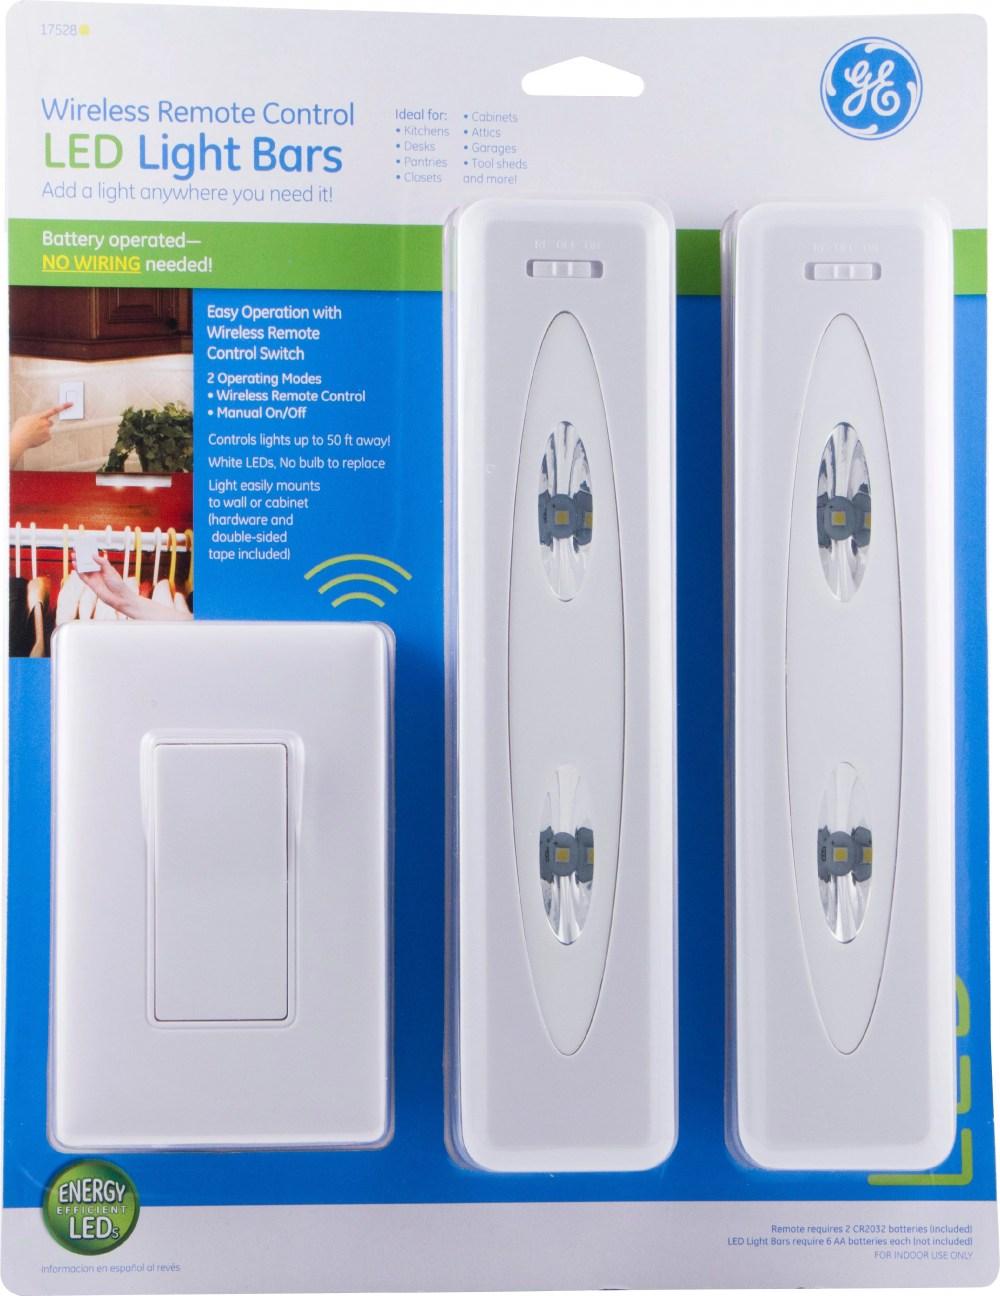 medium resolution of ge wireless remote control led light bars battery operated 17528 walmart com